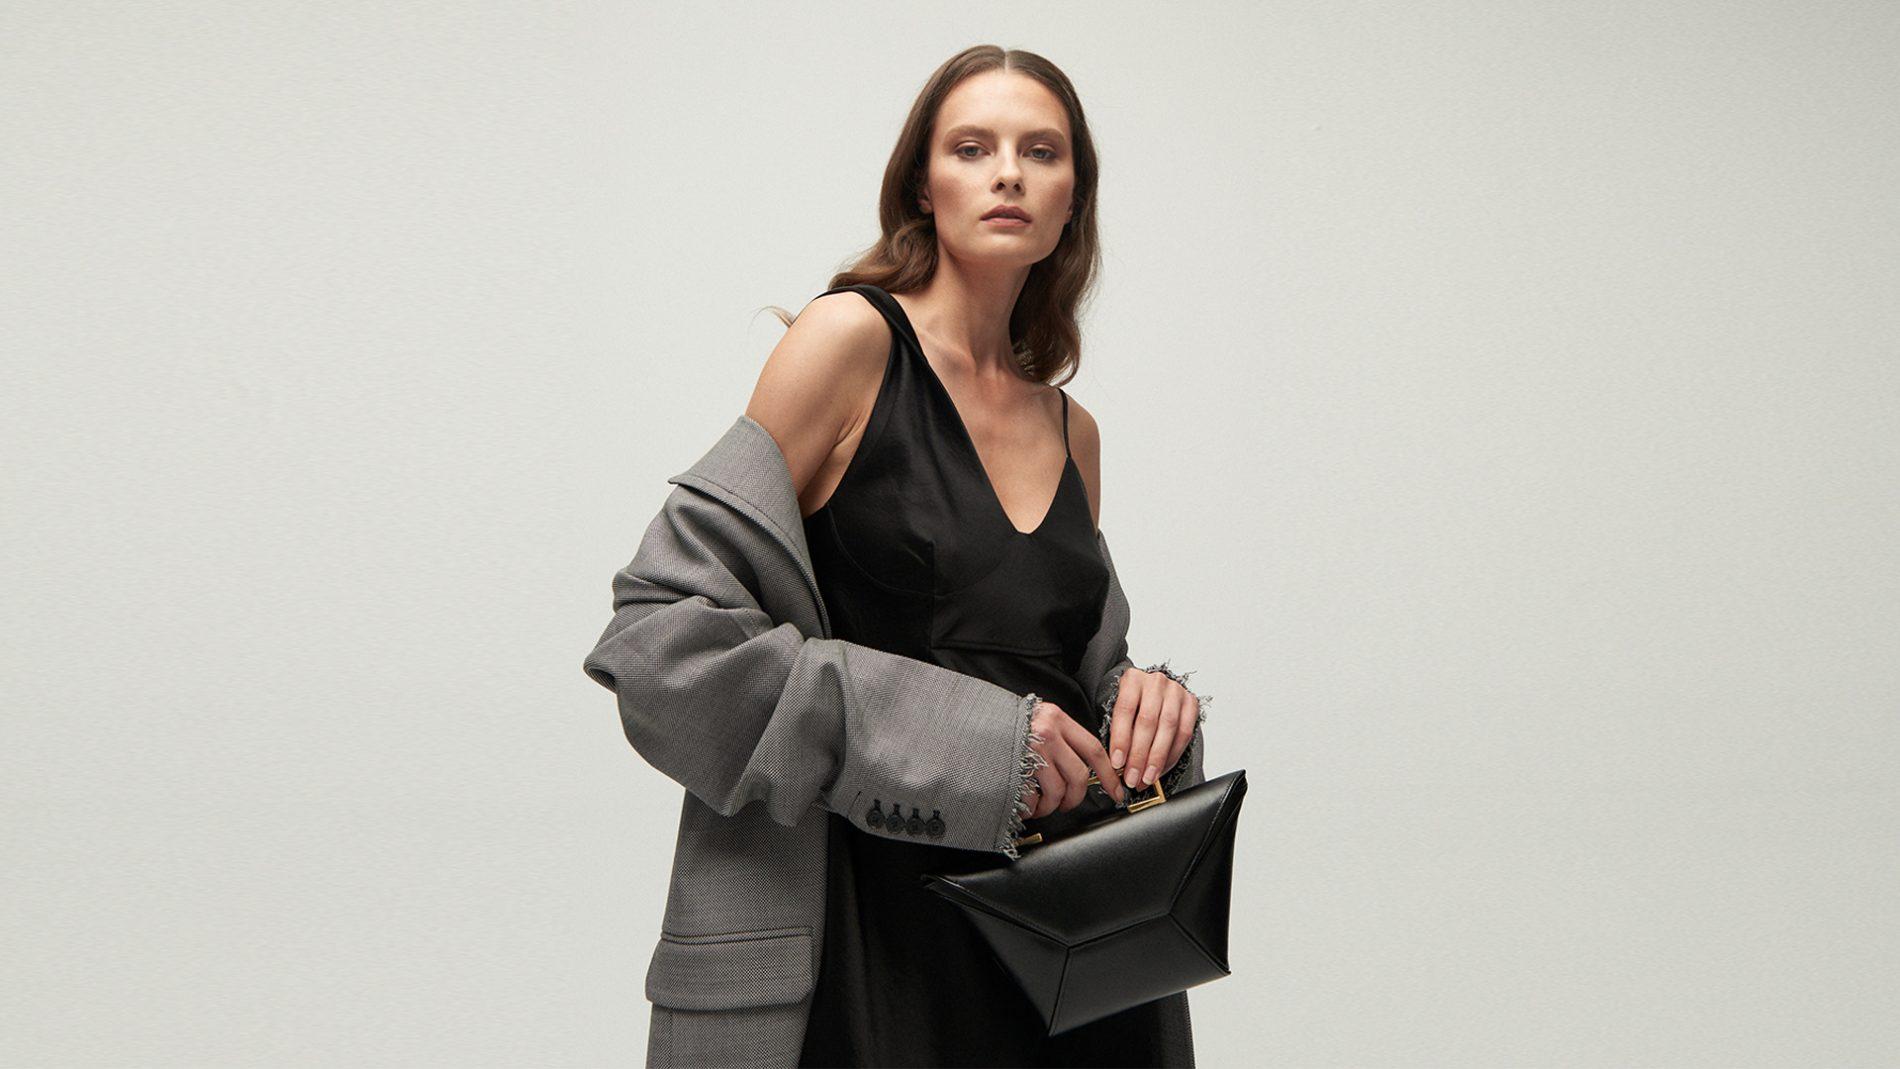 El Corte Inglés Ready-To-Wear Handbags Alexander Wang Helmut Lang Arinkel